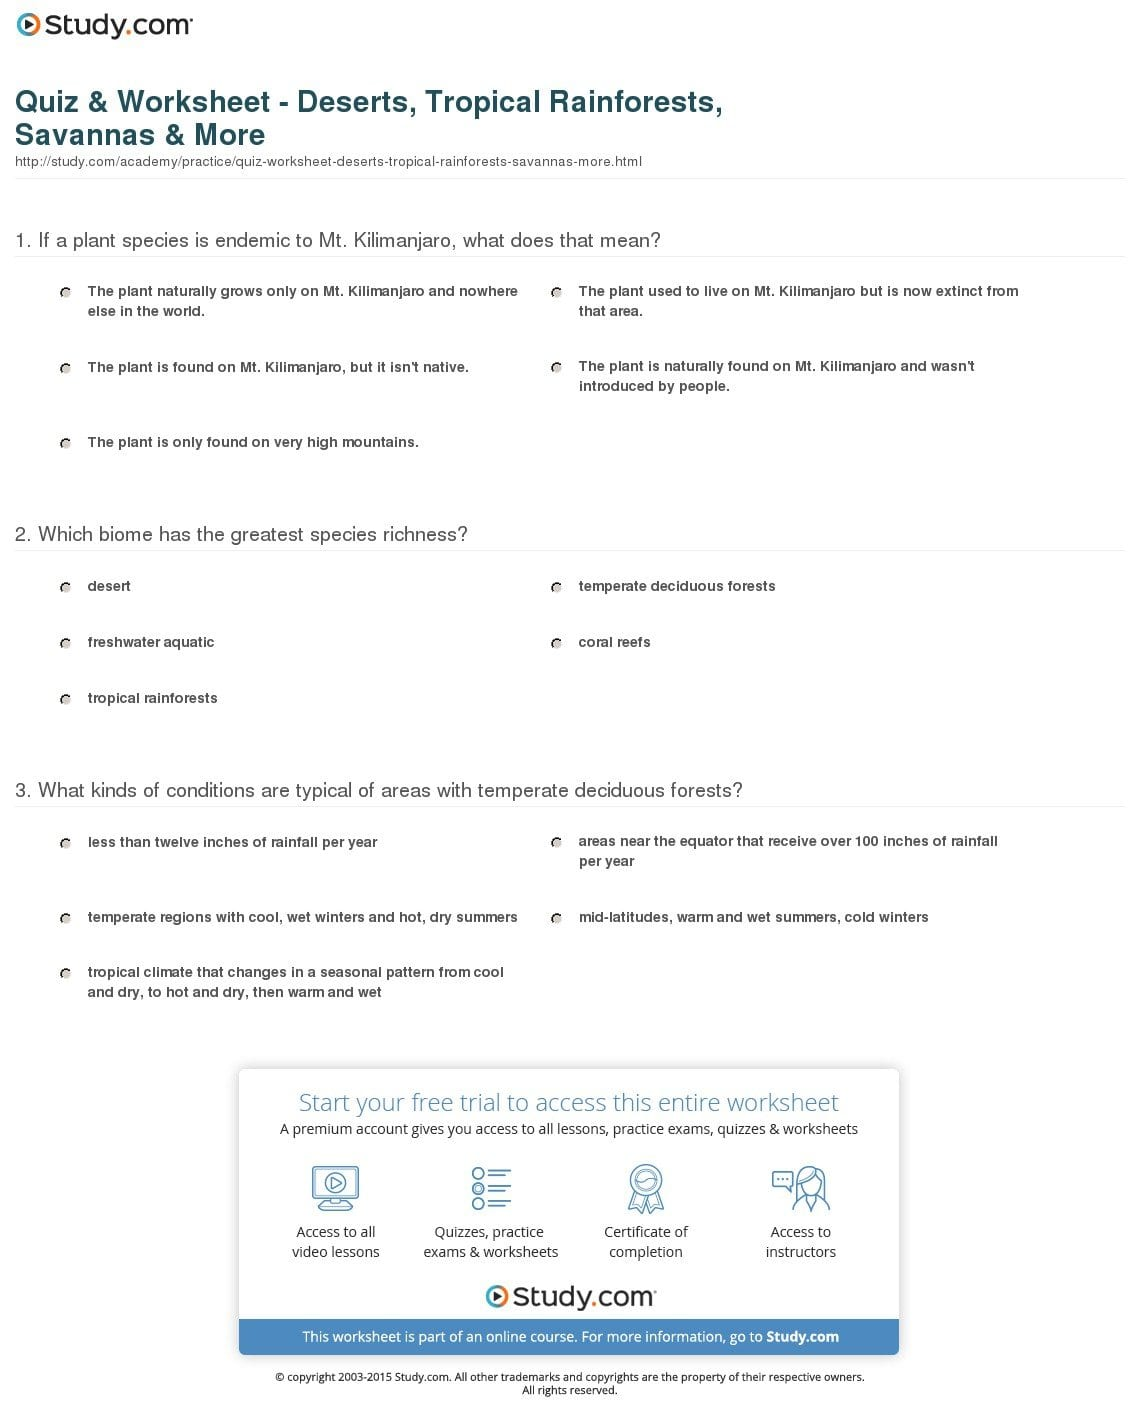 Exploring Biomes Worksheet Answers